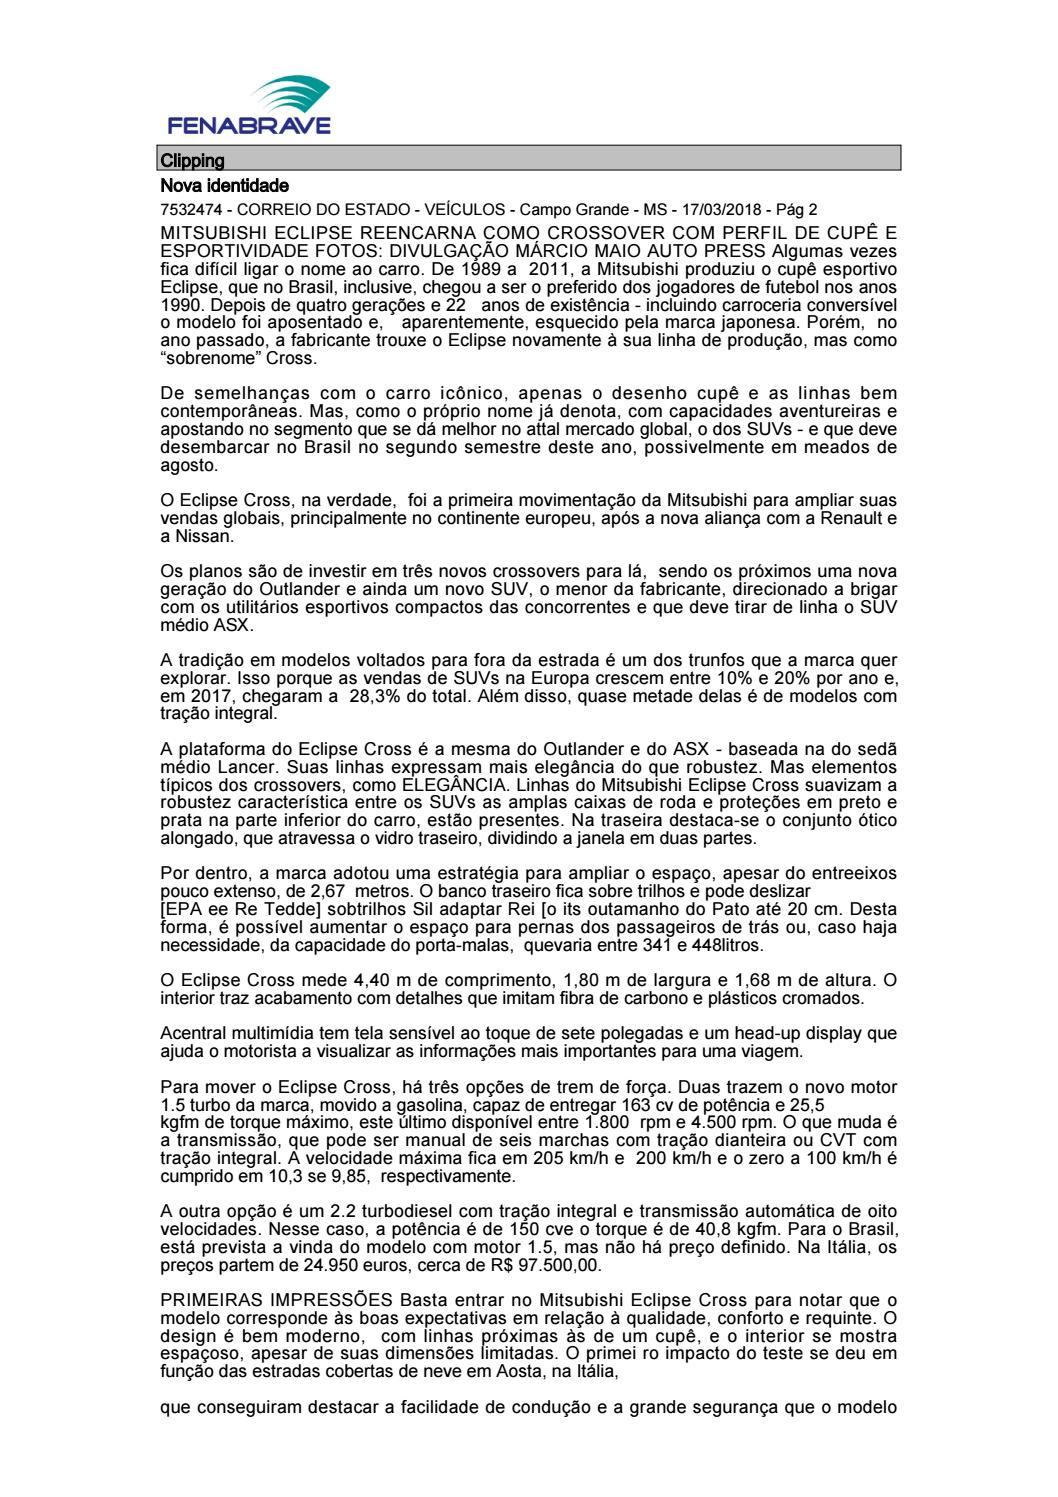 6bc2db8a94ad2 Clipping Fenabrave 19 03 2018 by MCE Comunicação - issuu